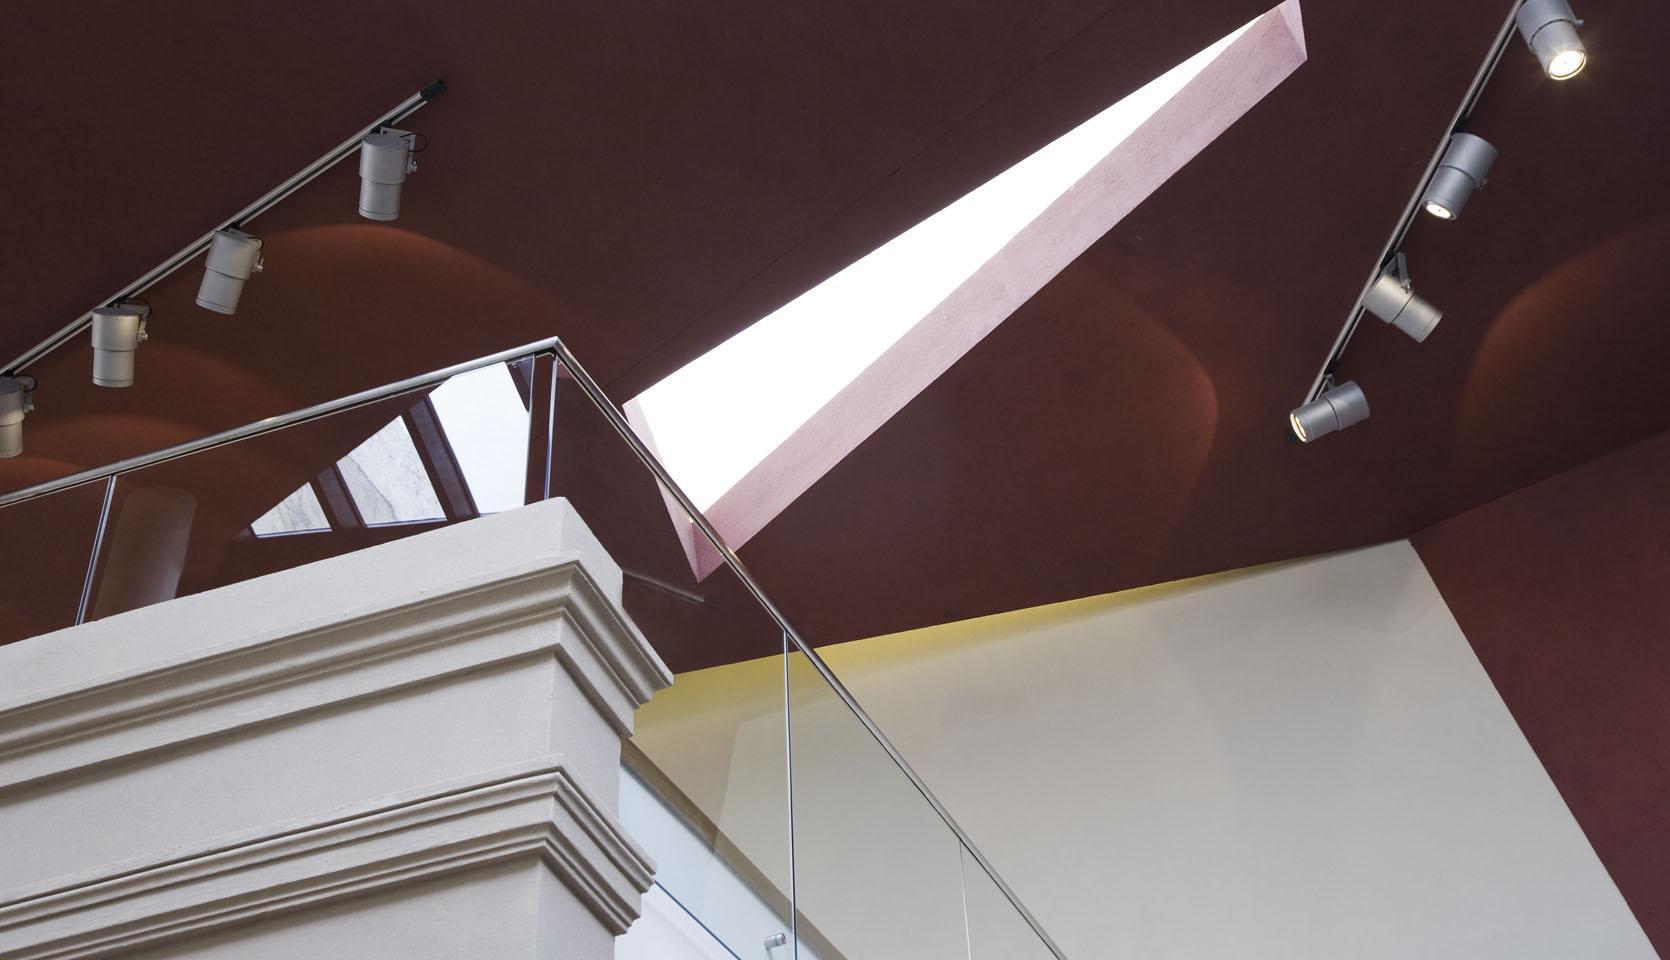 Diseño de techos modernos, integración de arquitectura clásica en espacios contemporáneos